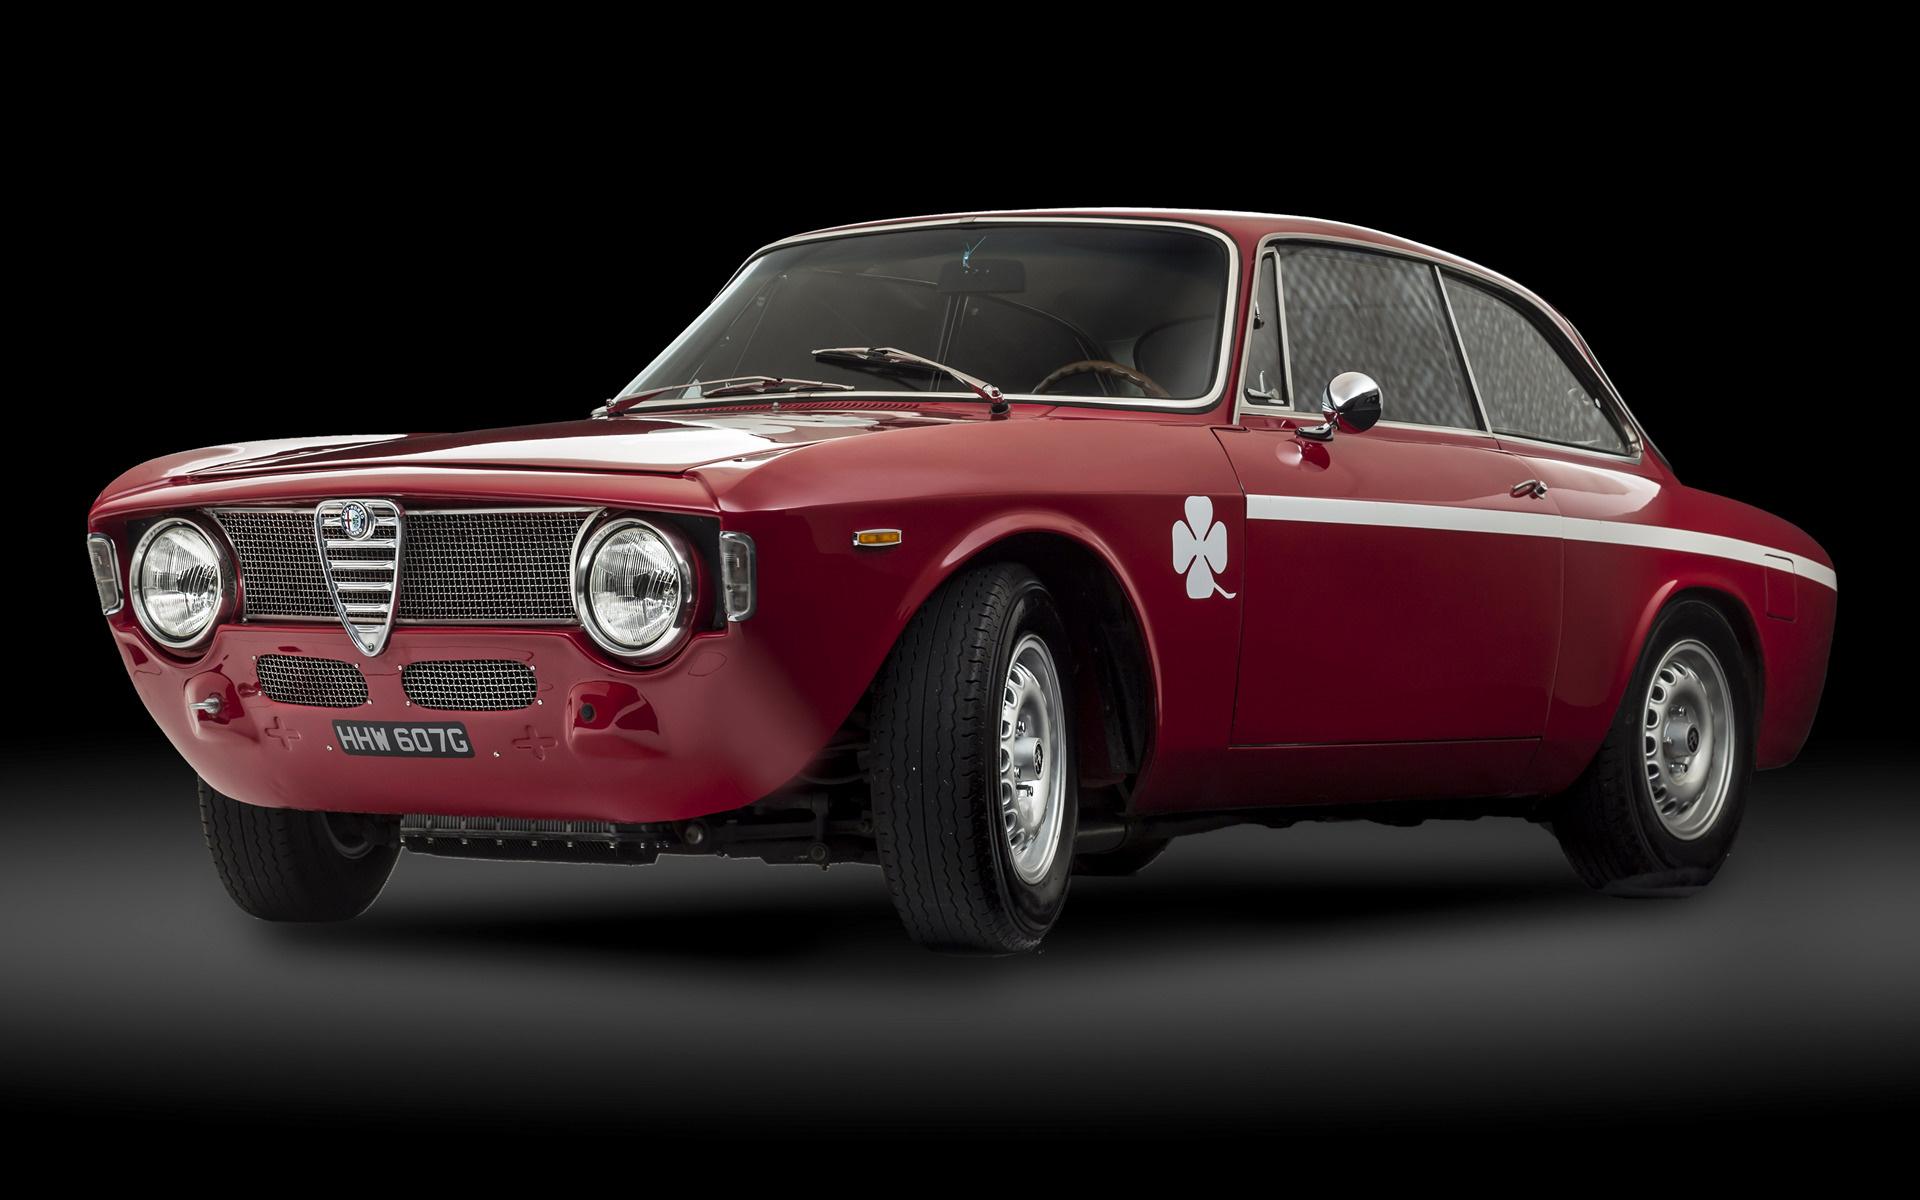 Alfa Romeo Gta Junior Car Wallpaper